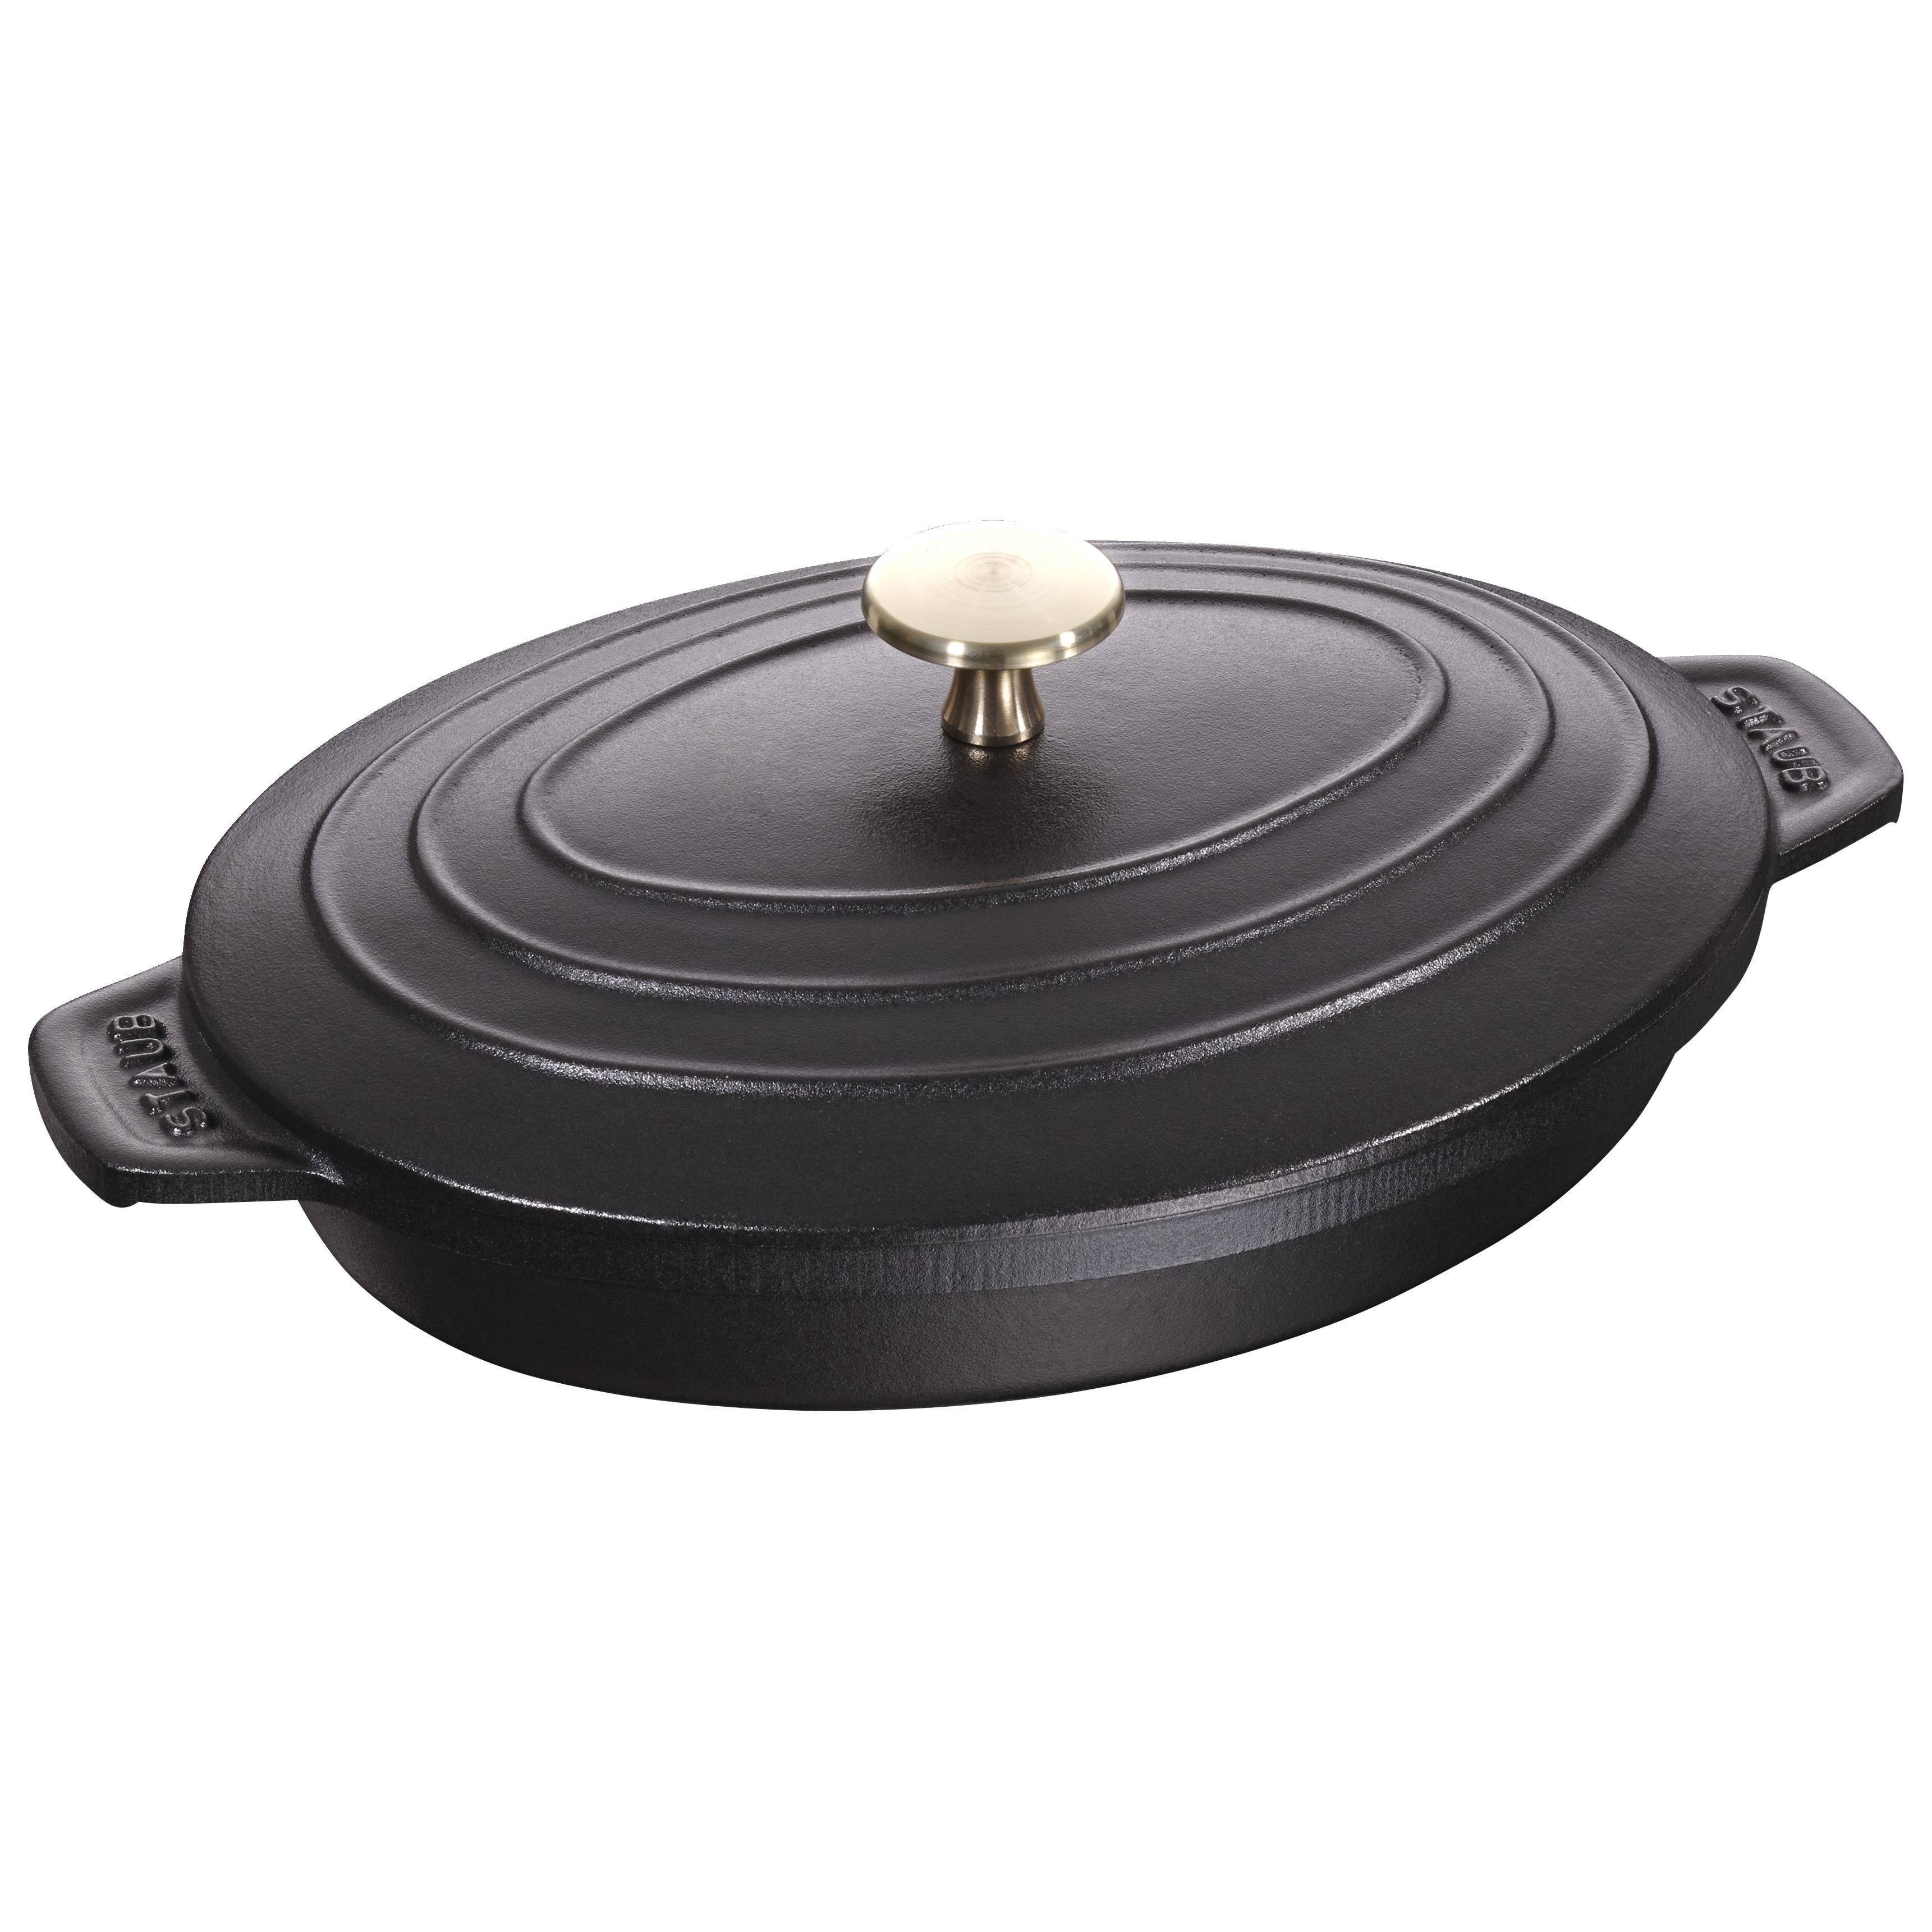 Clearance Sale! Fancy Cook 3 Piece Cast Iron Enamel Matt Black Skillet Set.